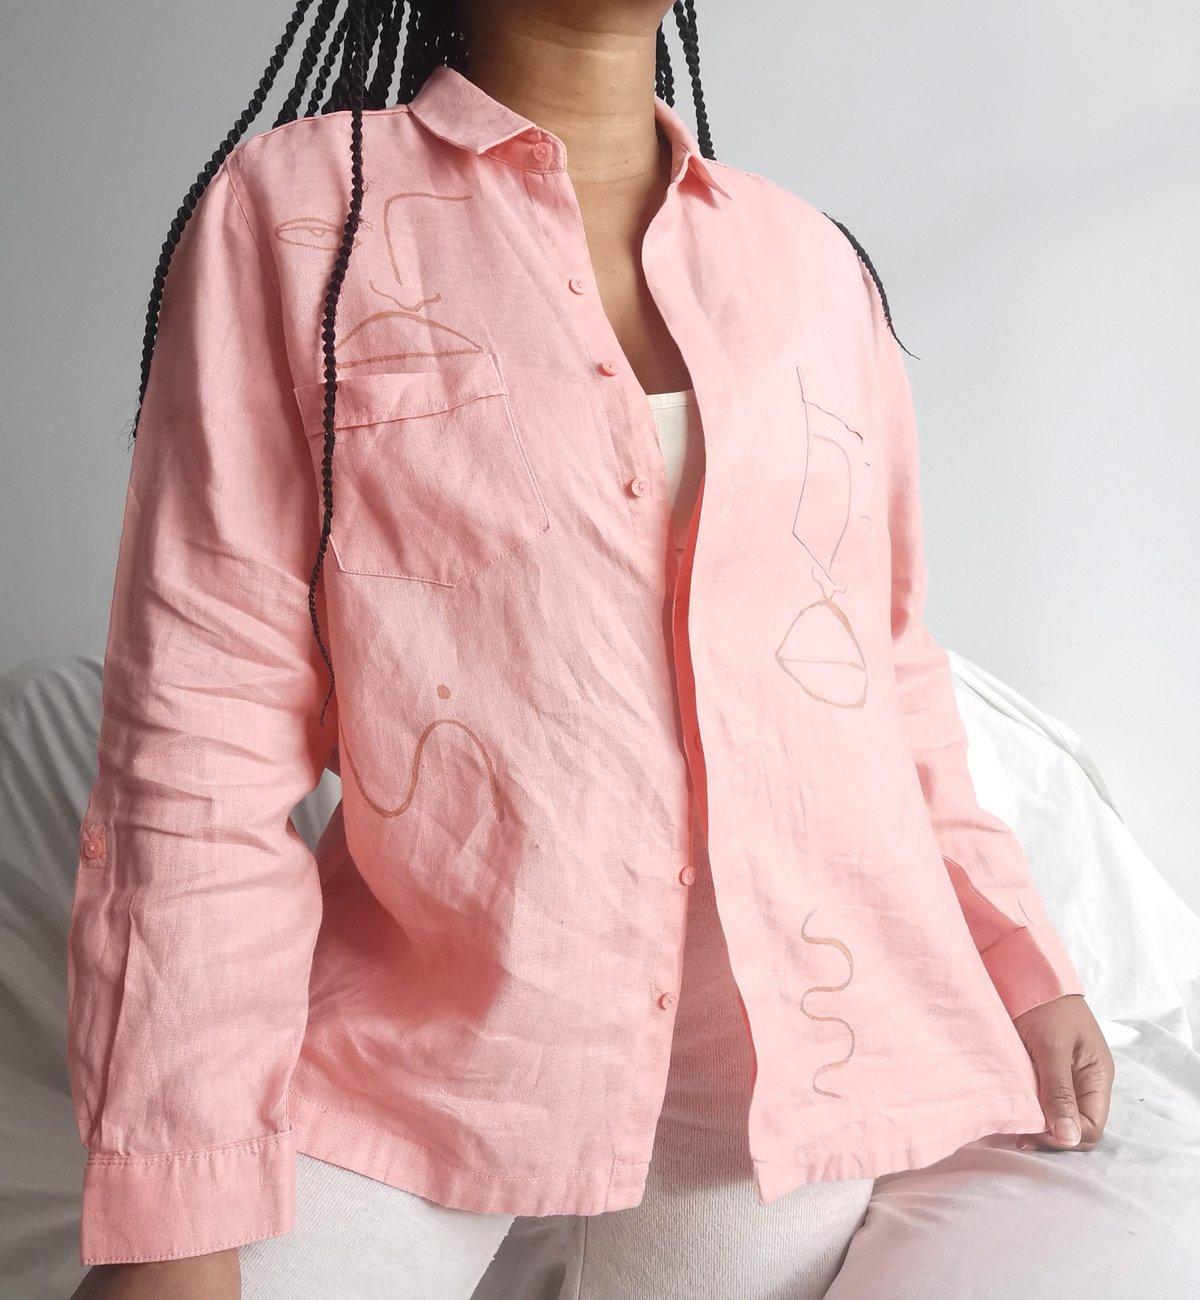 Image of pink ting shirt